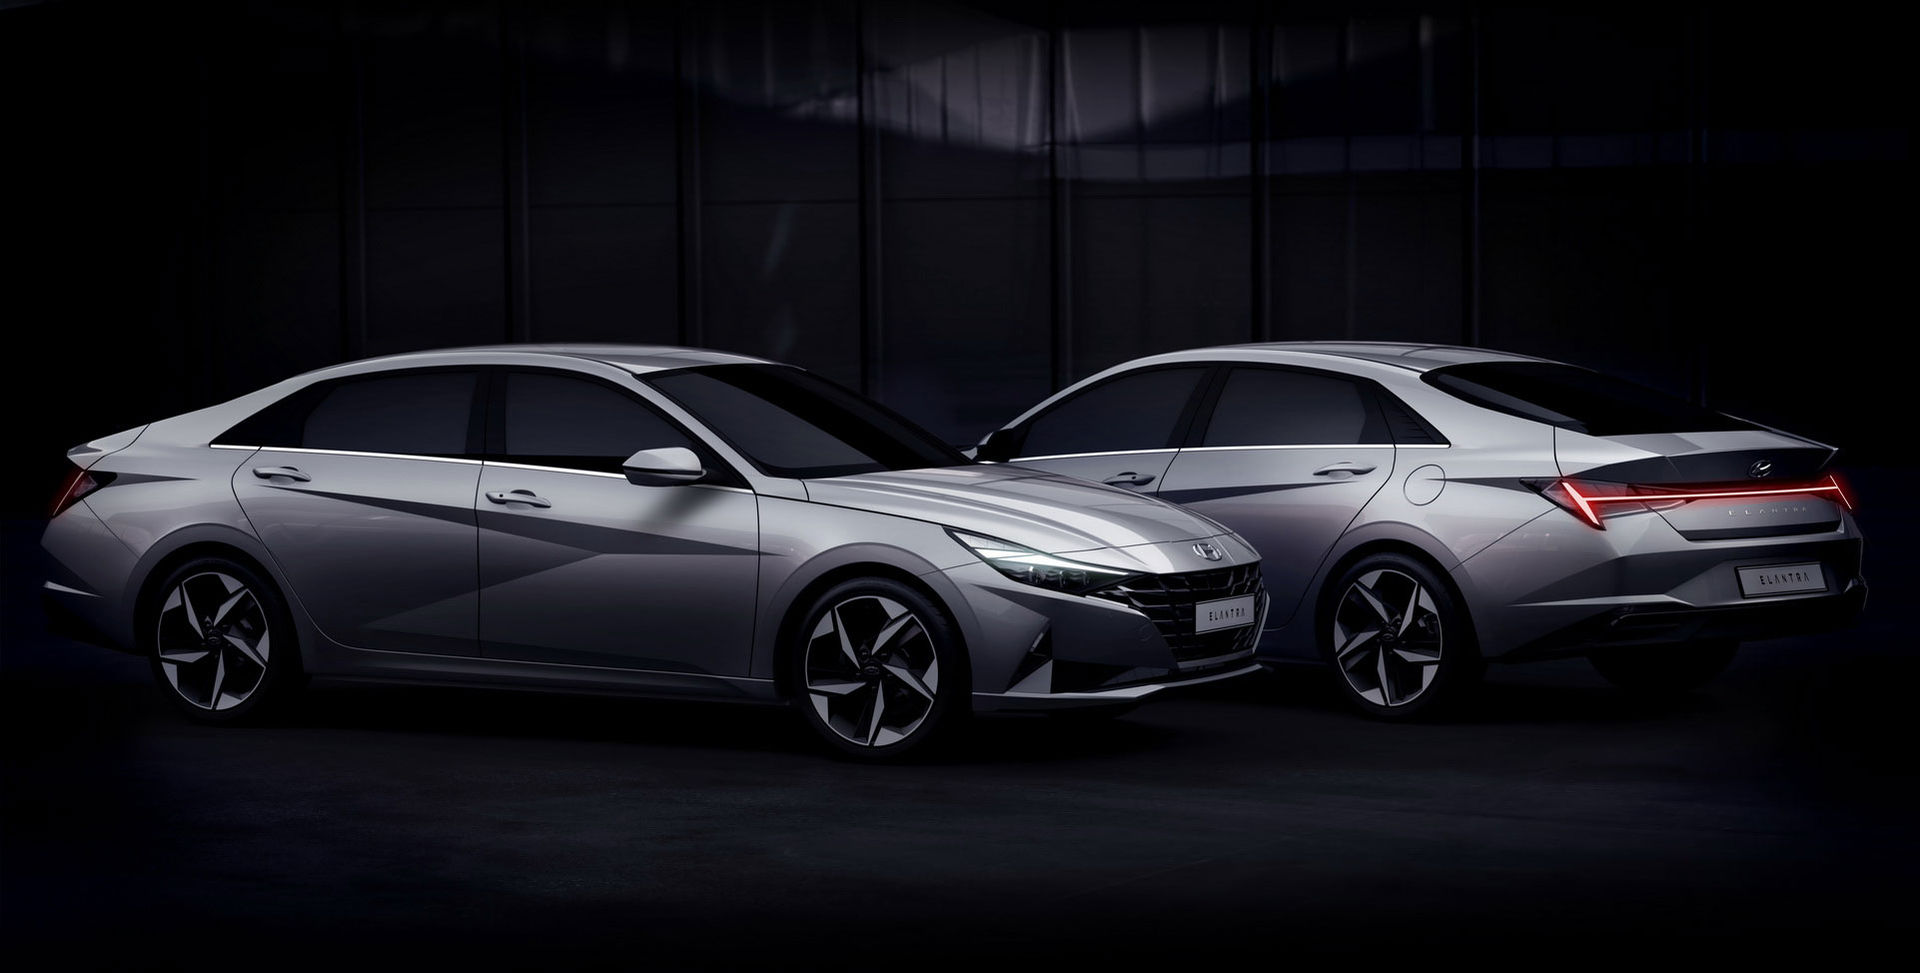 Hyundai rullar ut nya Elantra